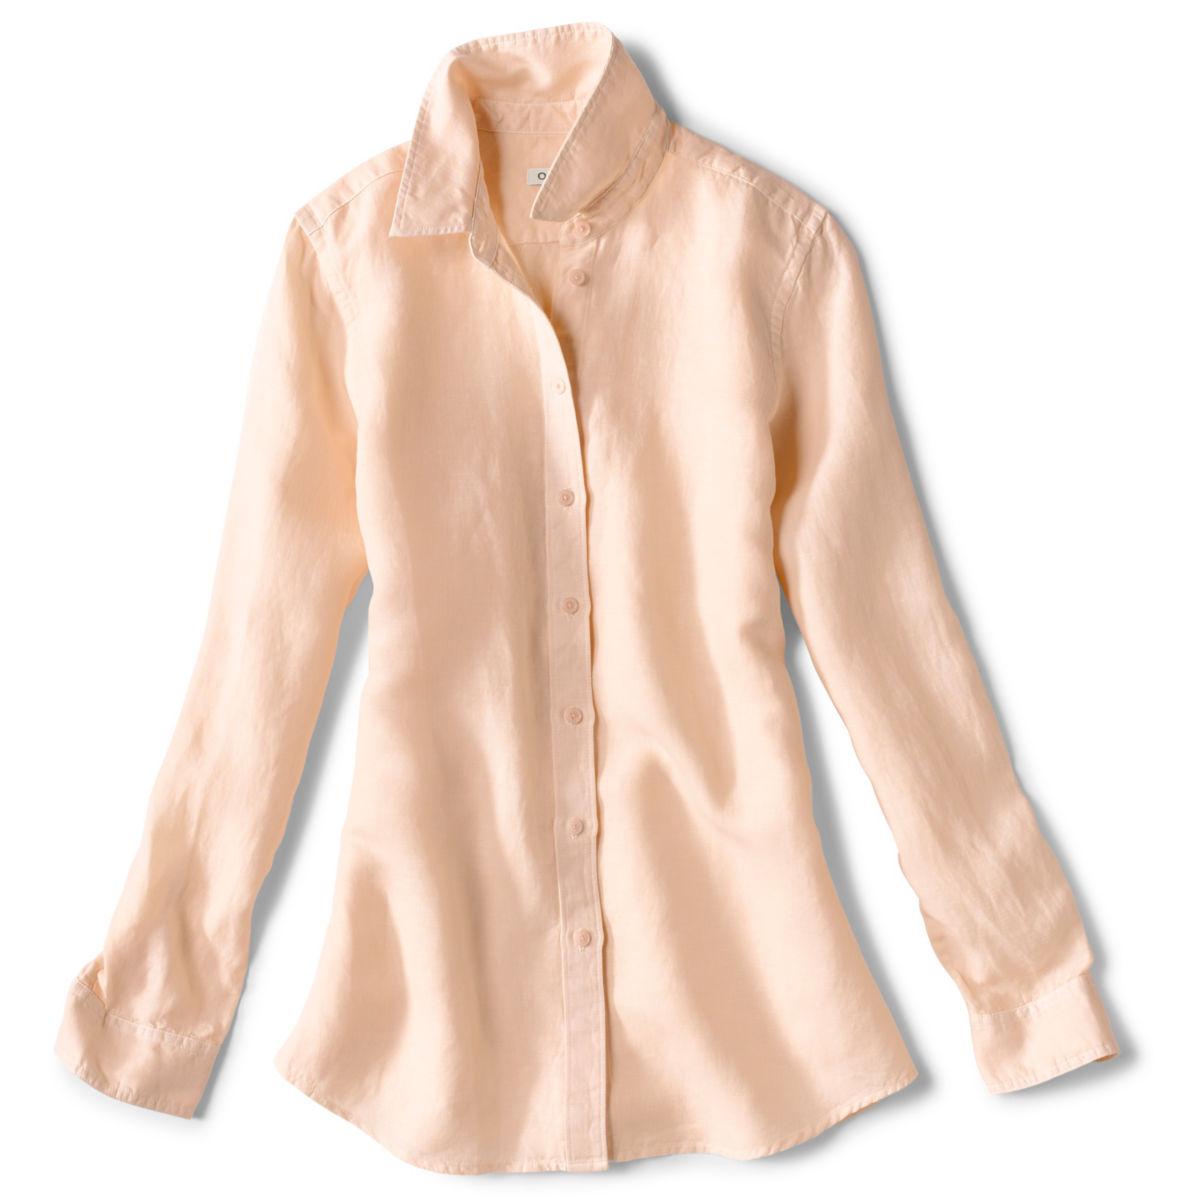 Linen/Tencel Herringbone Shirt - ROSE MISTimage number 0